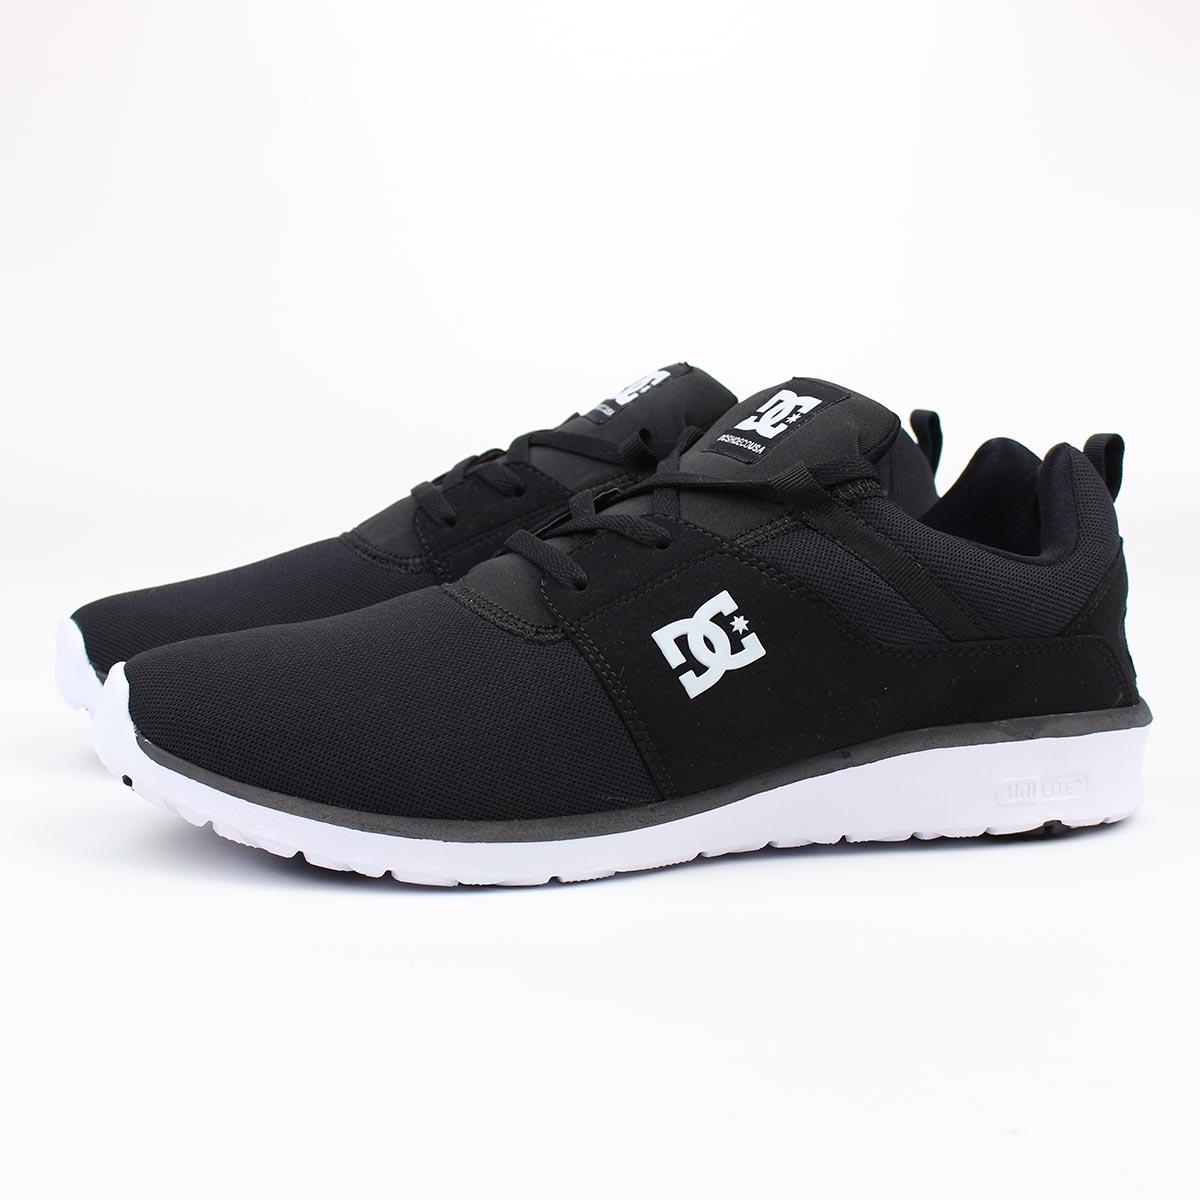 Dc Shoes Uk Heathrow